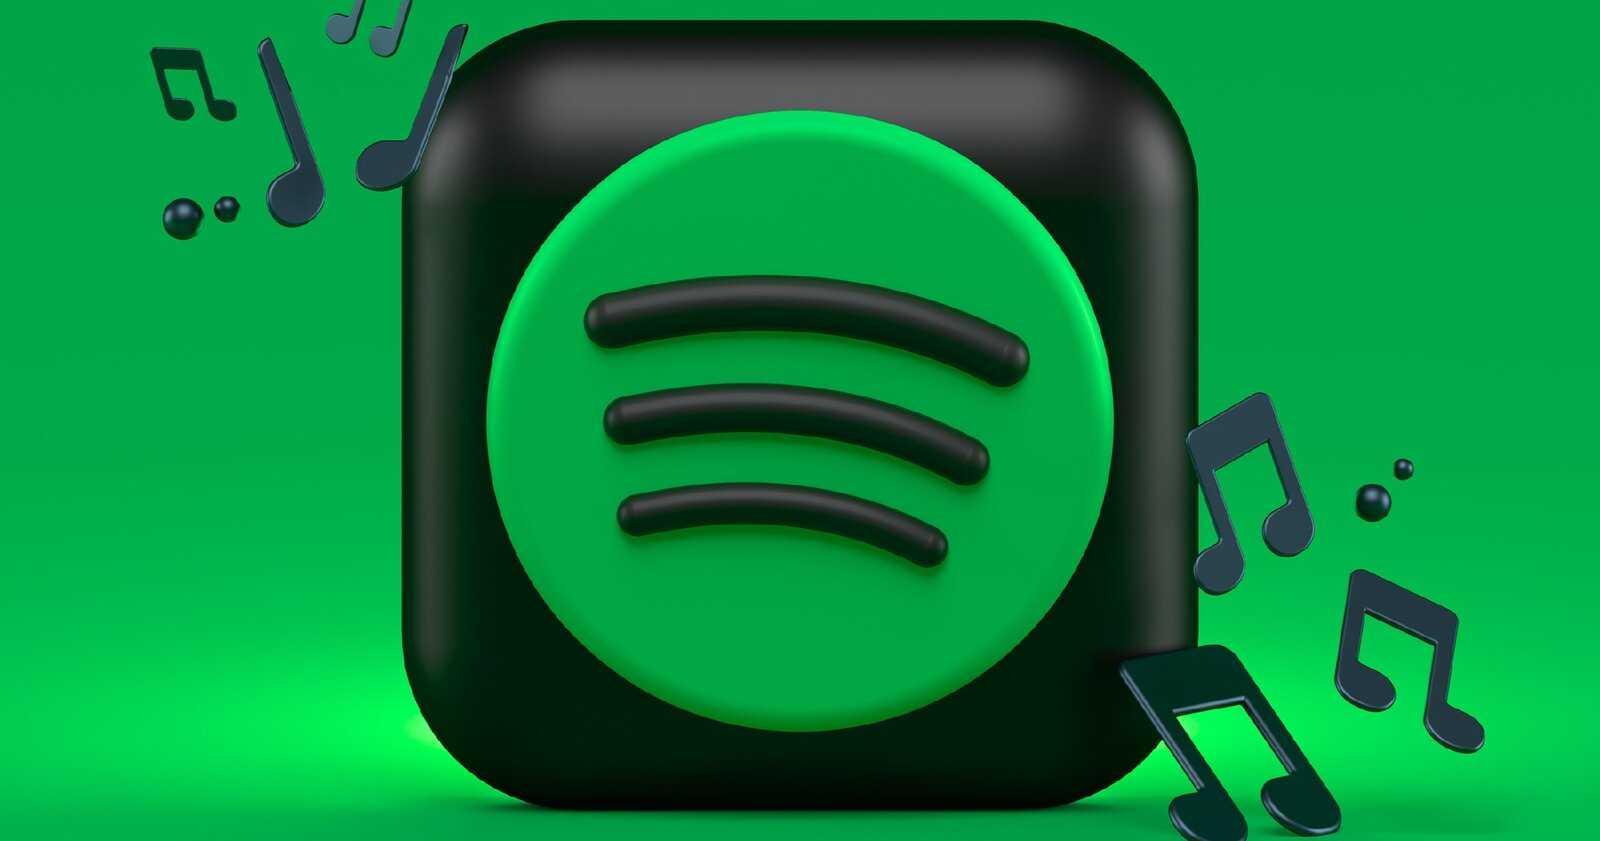 L'icône de l'application Spotify